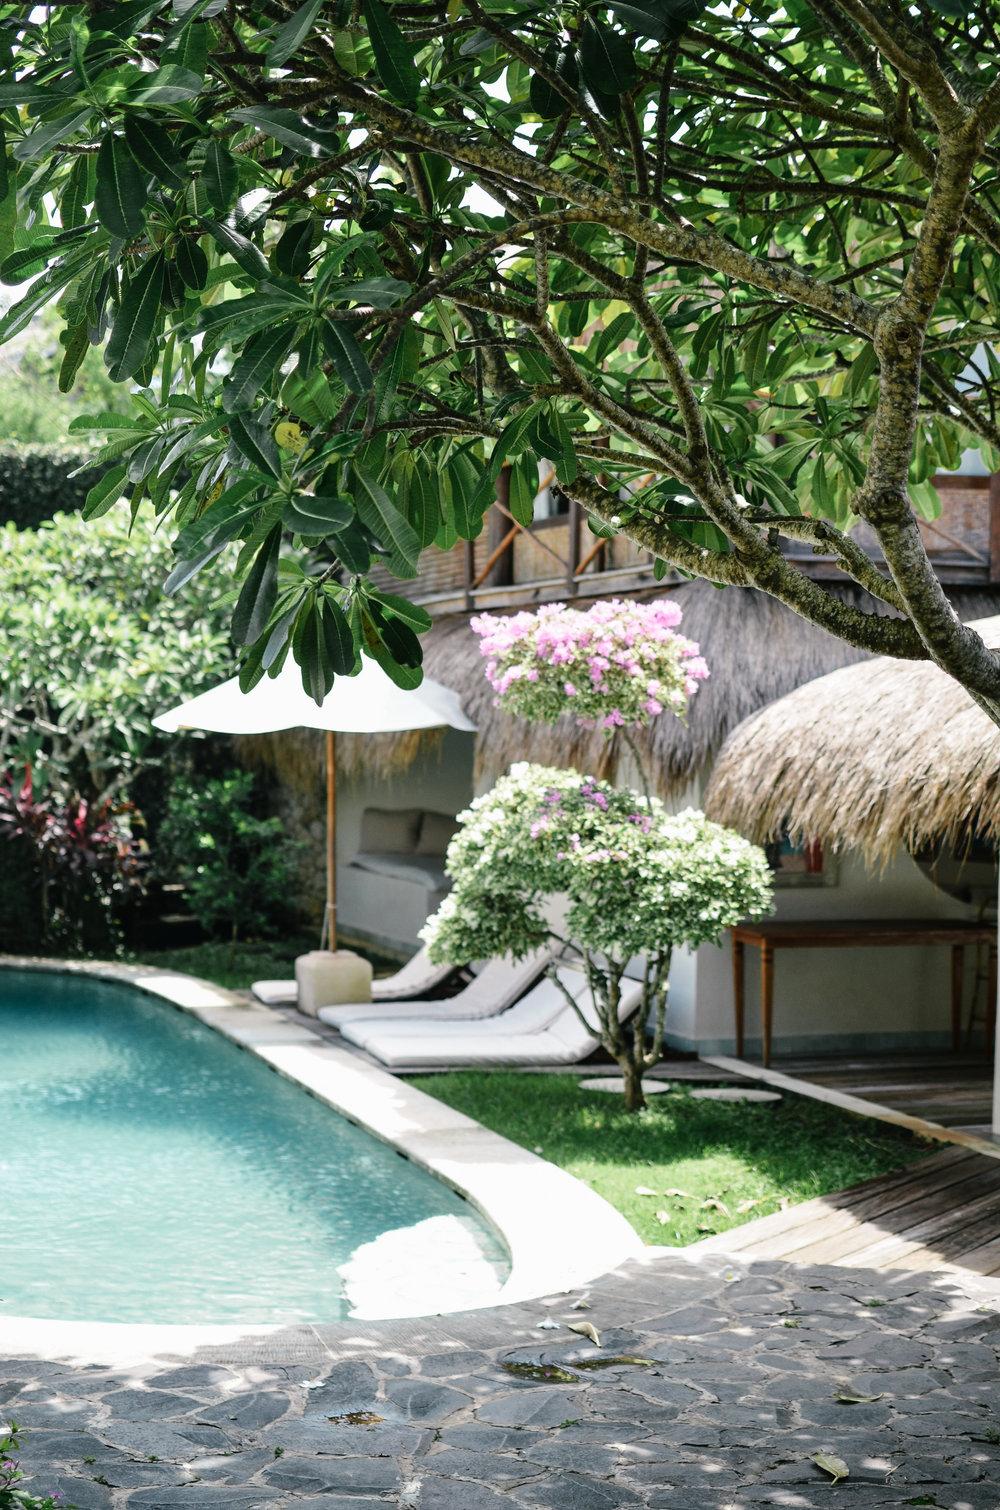 mu-villa-bali-boutique-hotel-lifeonpine_DSC_2199.jpg